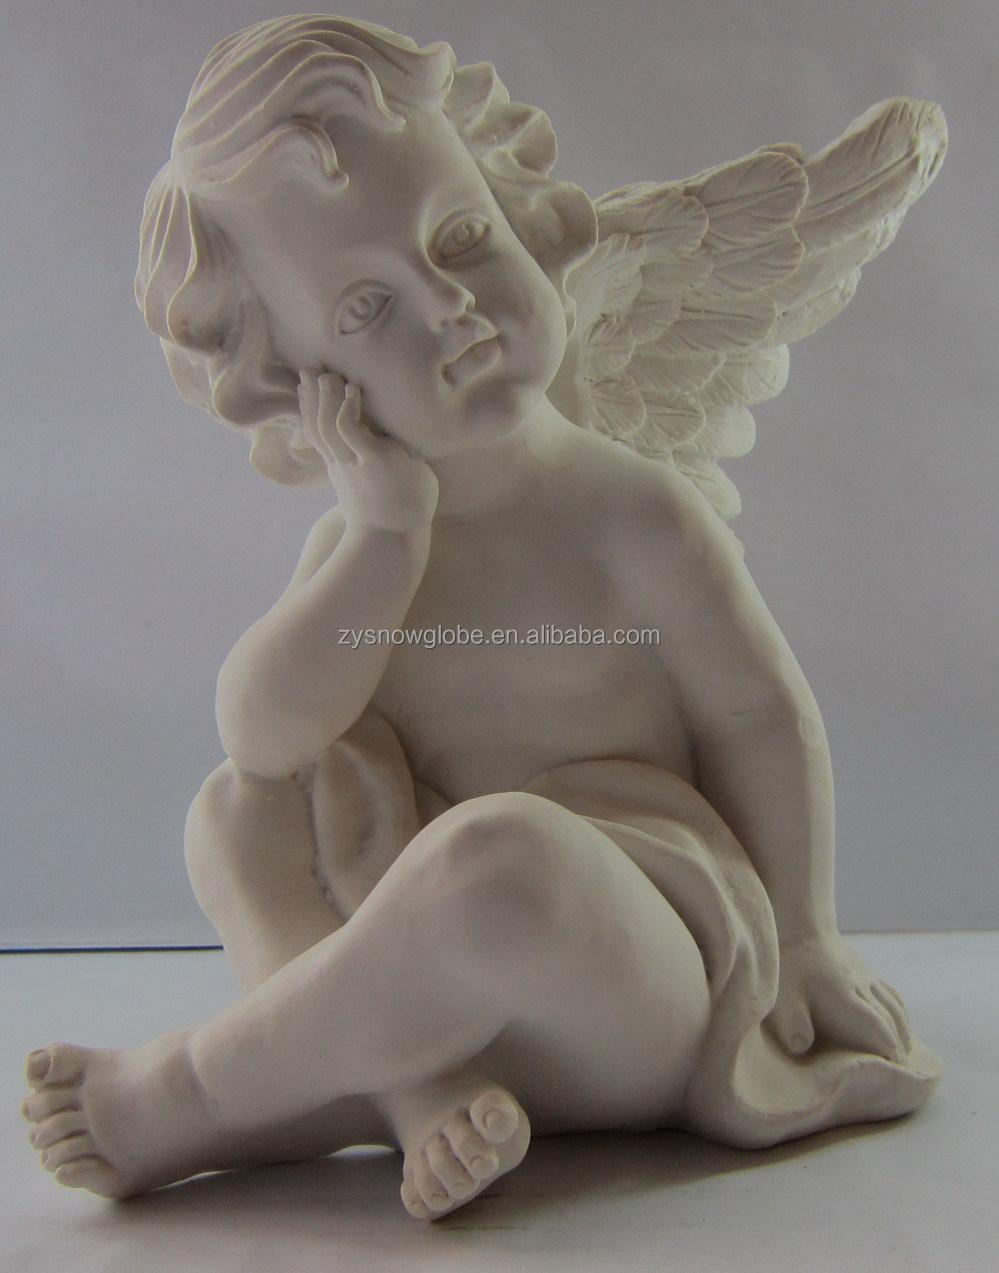 New Arrival Resin Religious Little Angel Statue